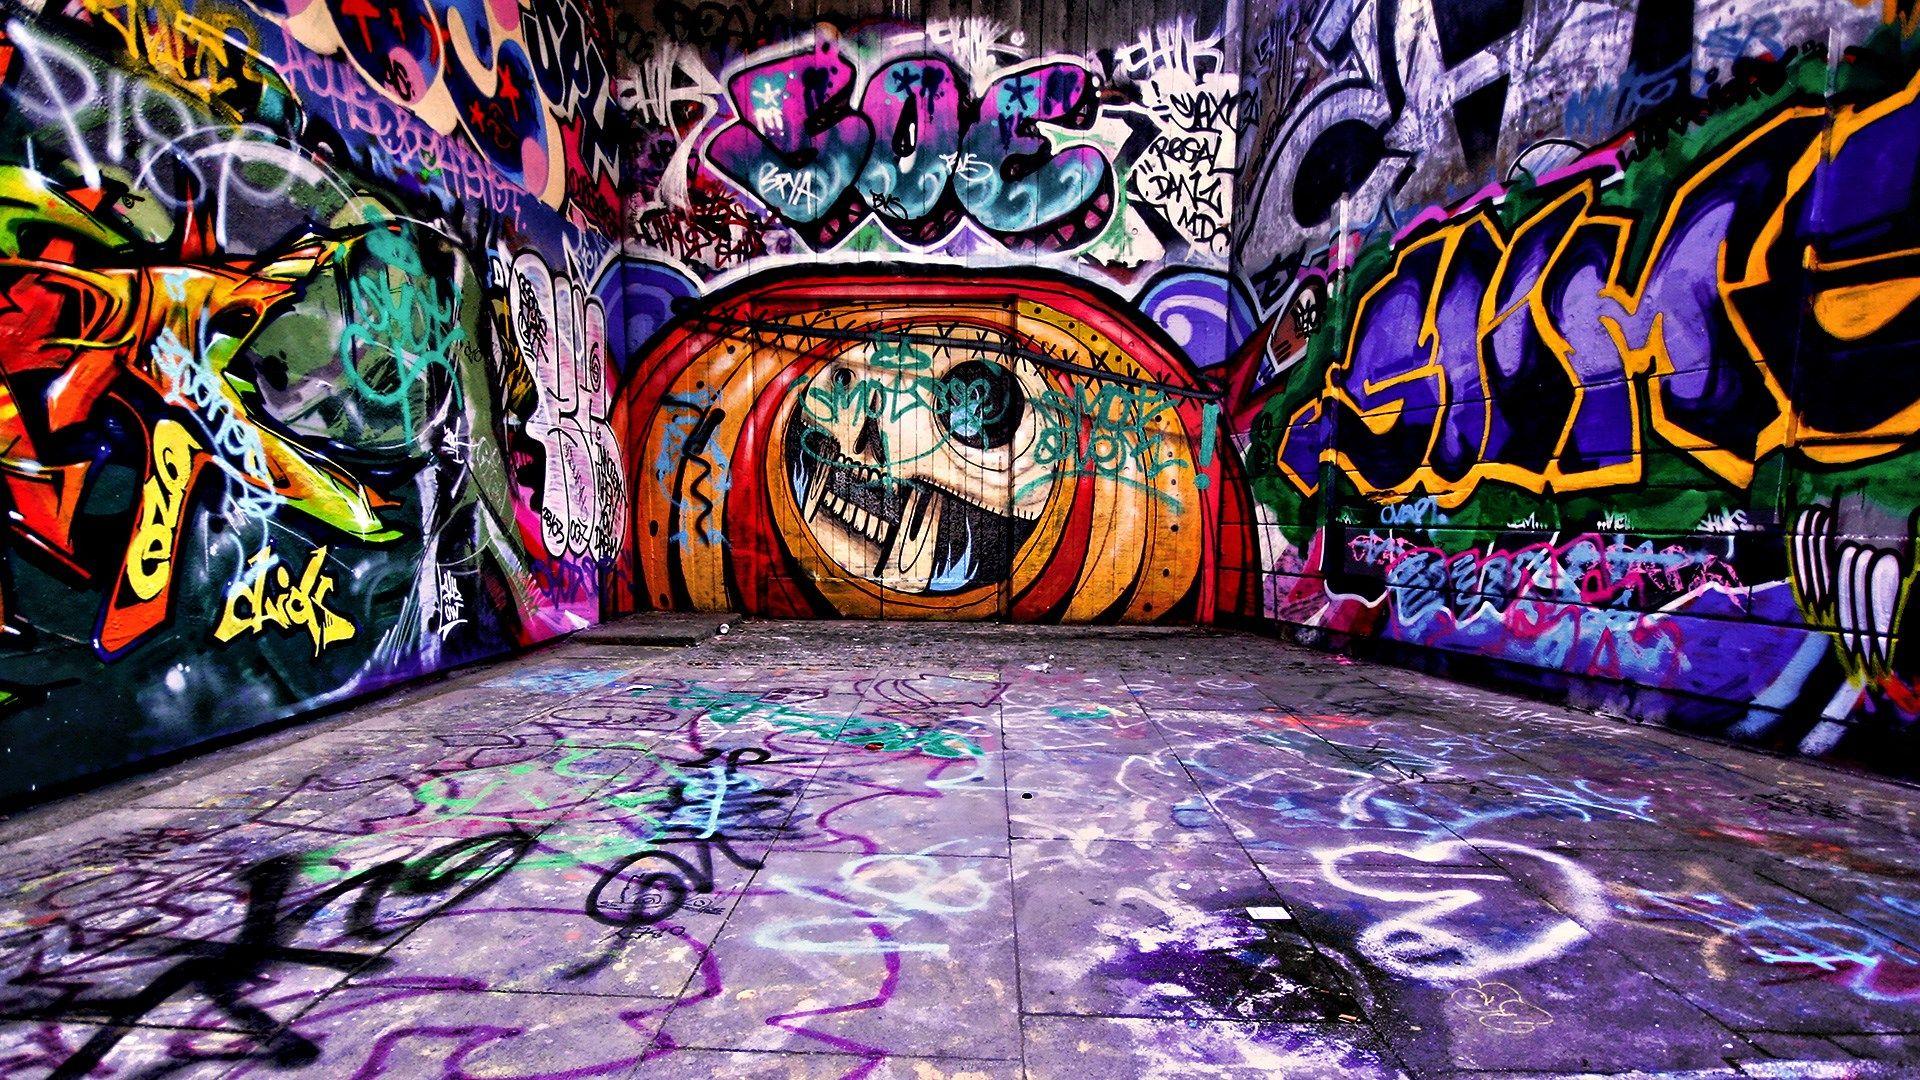 Edgar Fletcher Grafiti Picture Background Hd 1920 X 1080 Px  ~ Papel De Parede Grafite Para Quarto